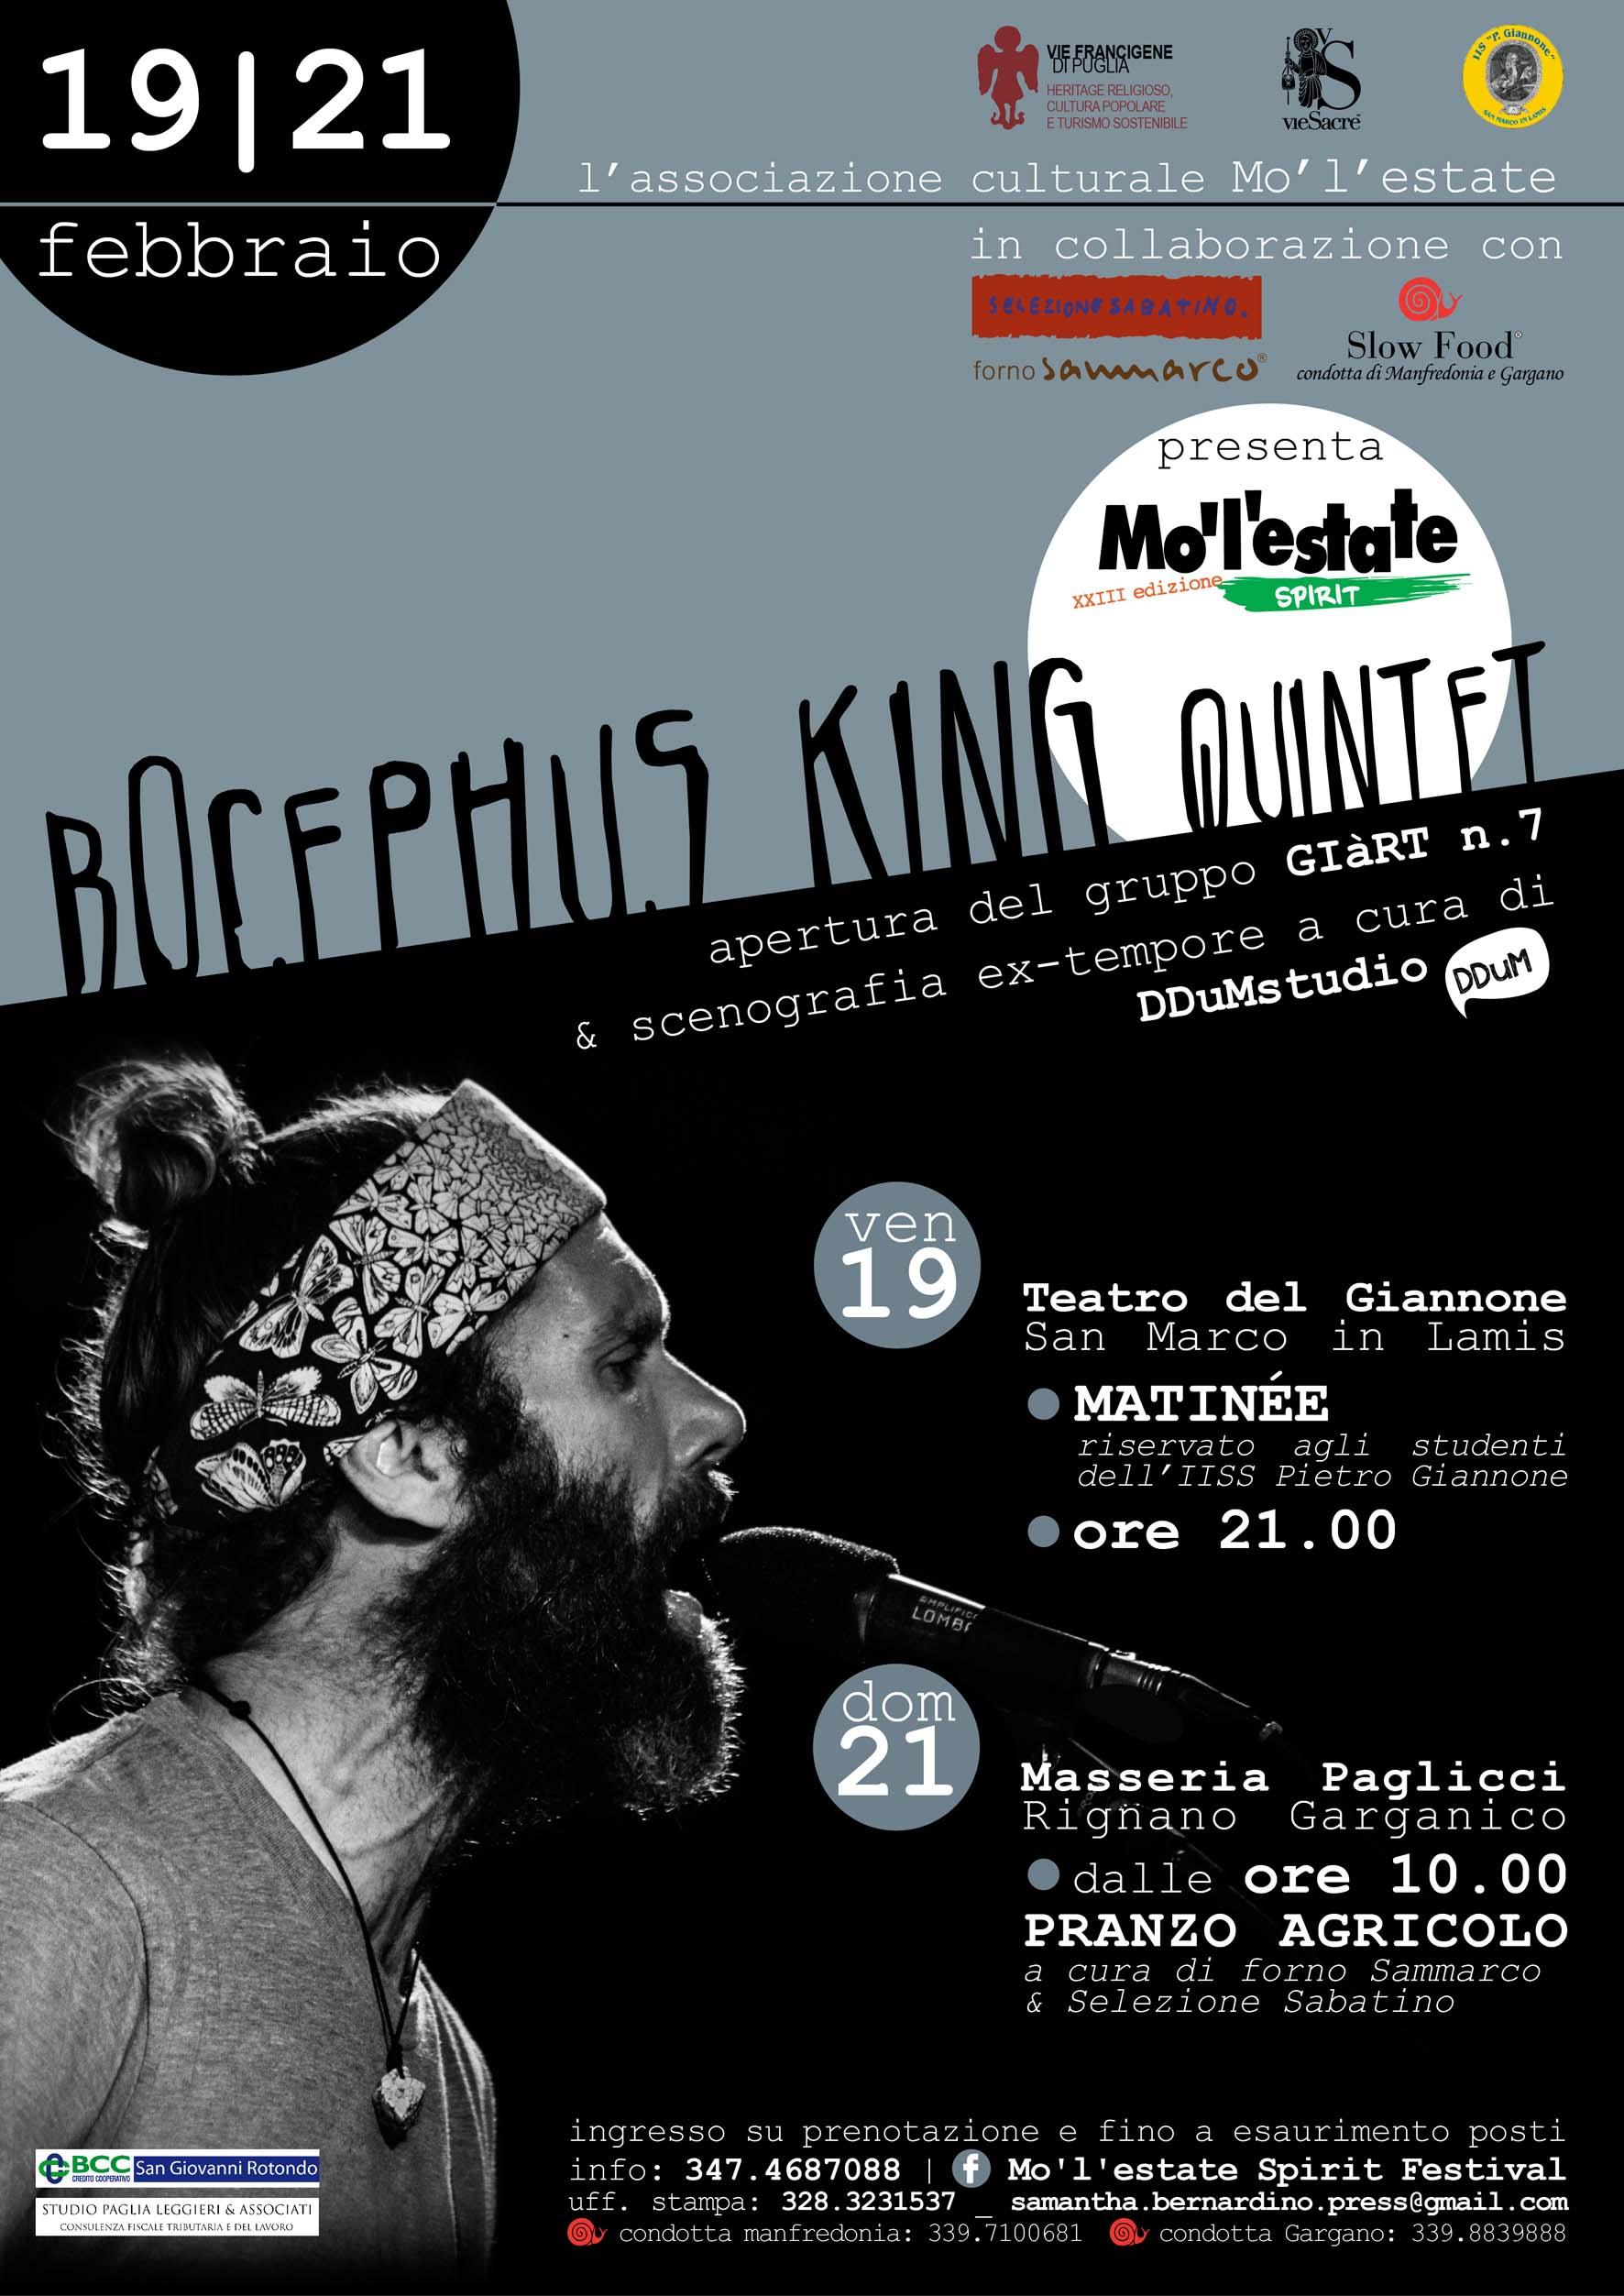 BOCEPHUS KING LIVE SUL GARGANO PER MO'L'ESTATE SPIRIT FESTIVAL